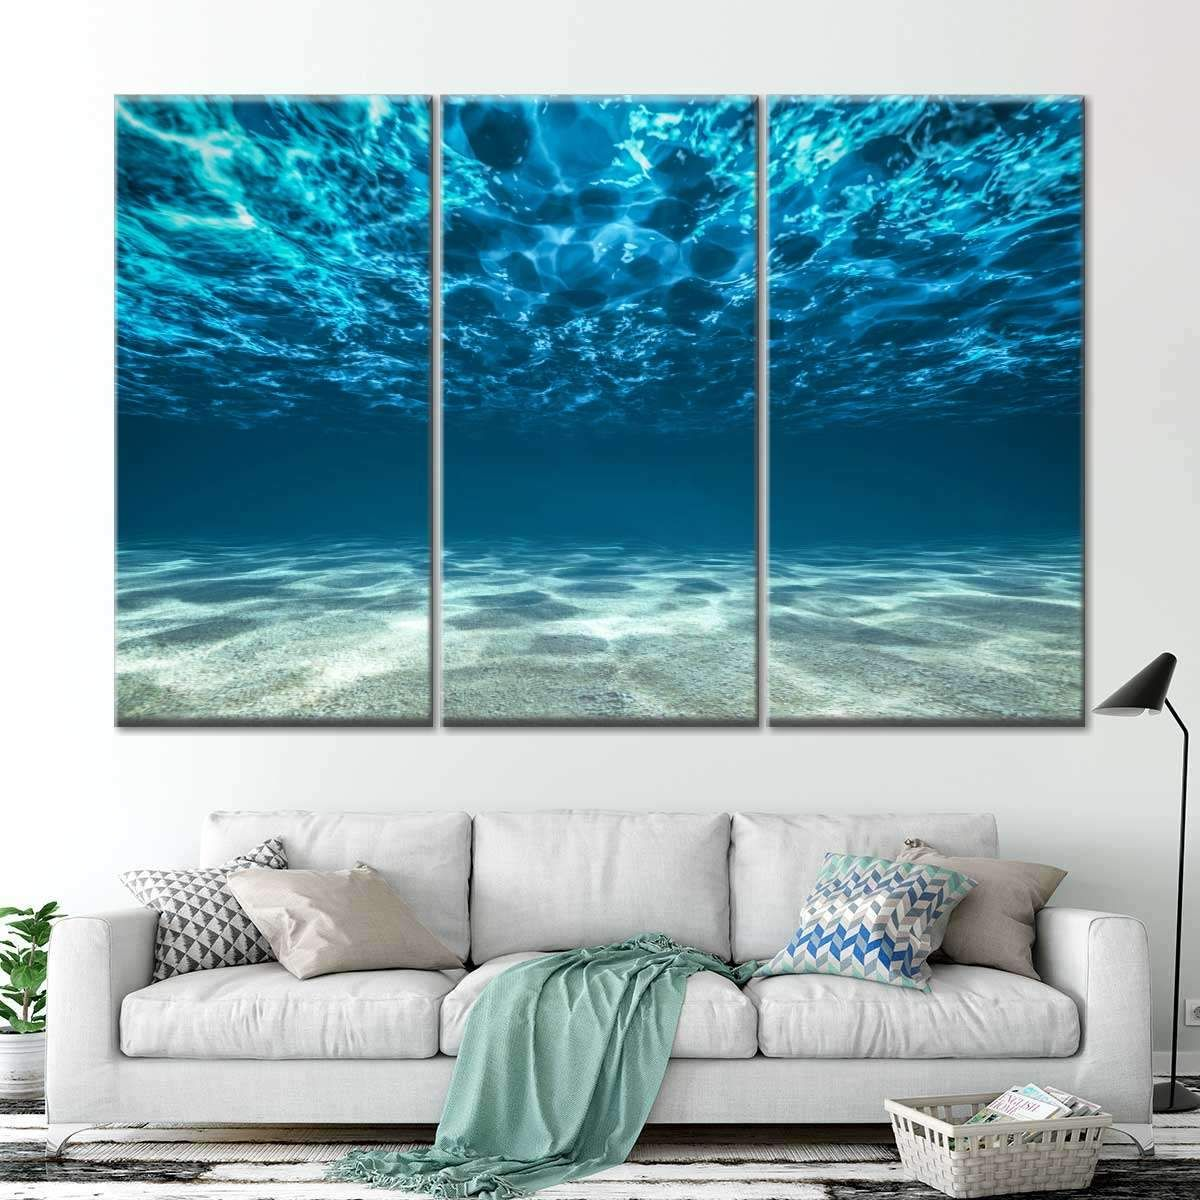 Underwater Multi Panel Canvas Wall Art In 2020 Multi Panel Canvas Ocean Canvas Canvas Wall Art